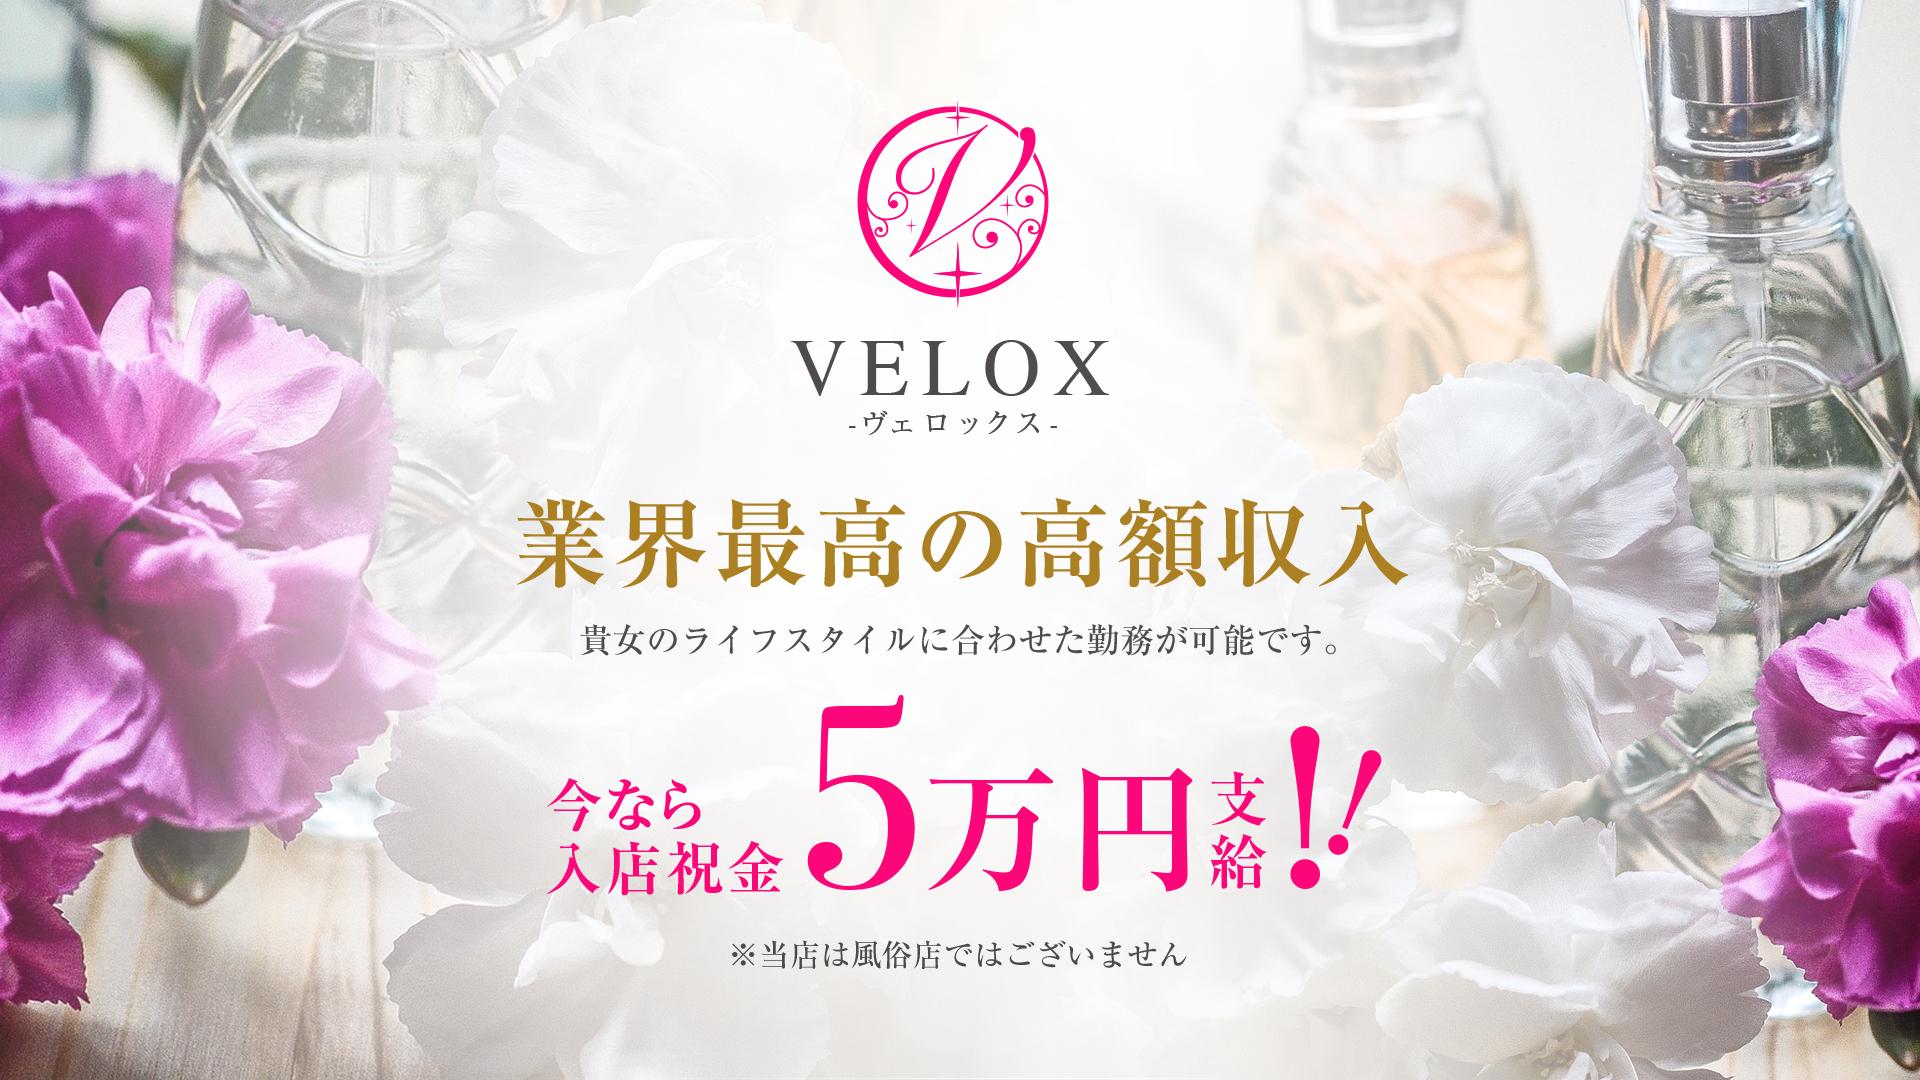 VELOX -ヴェロックスの求人画像